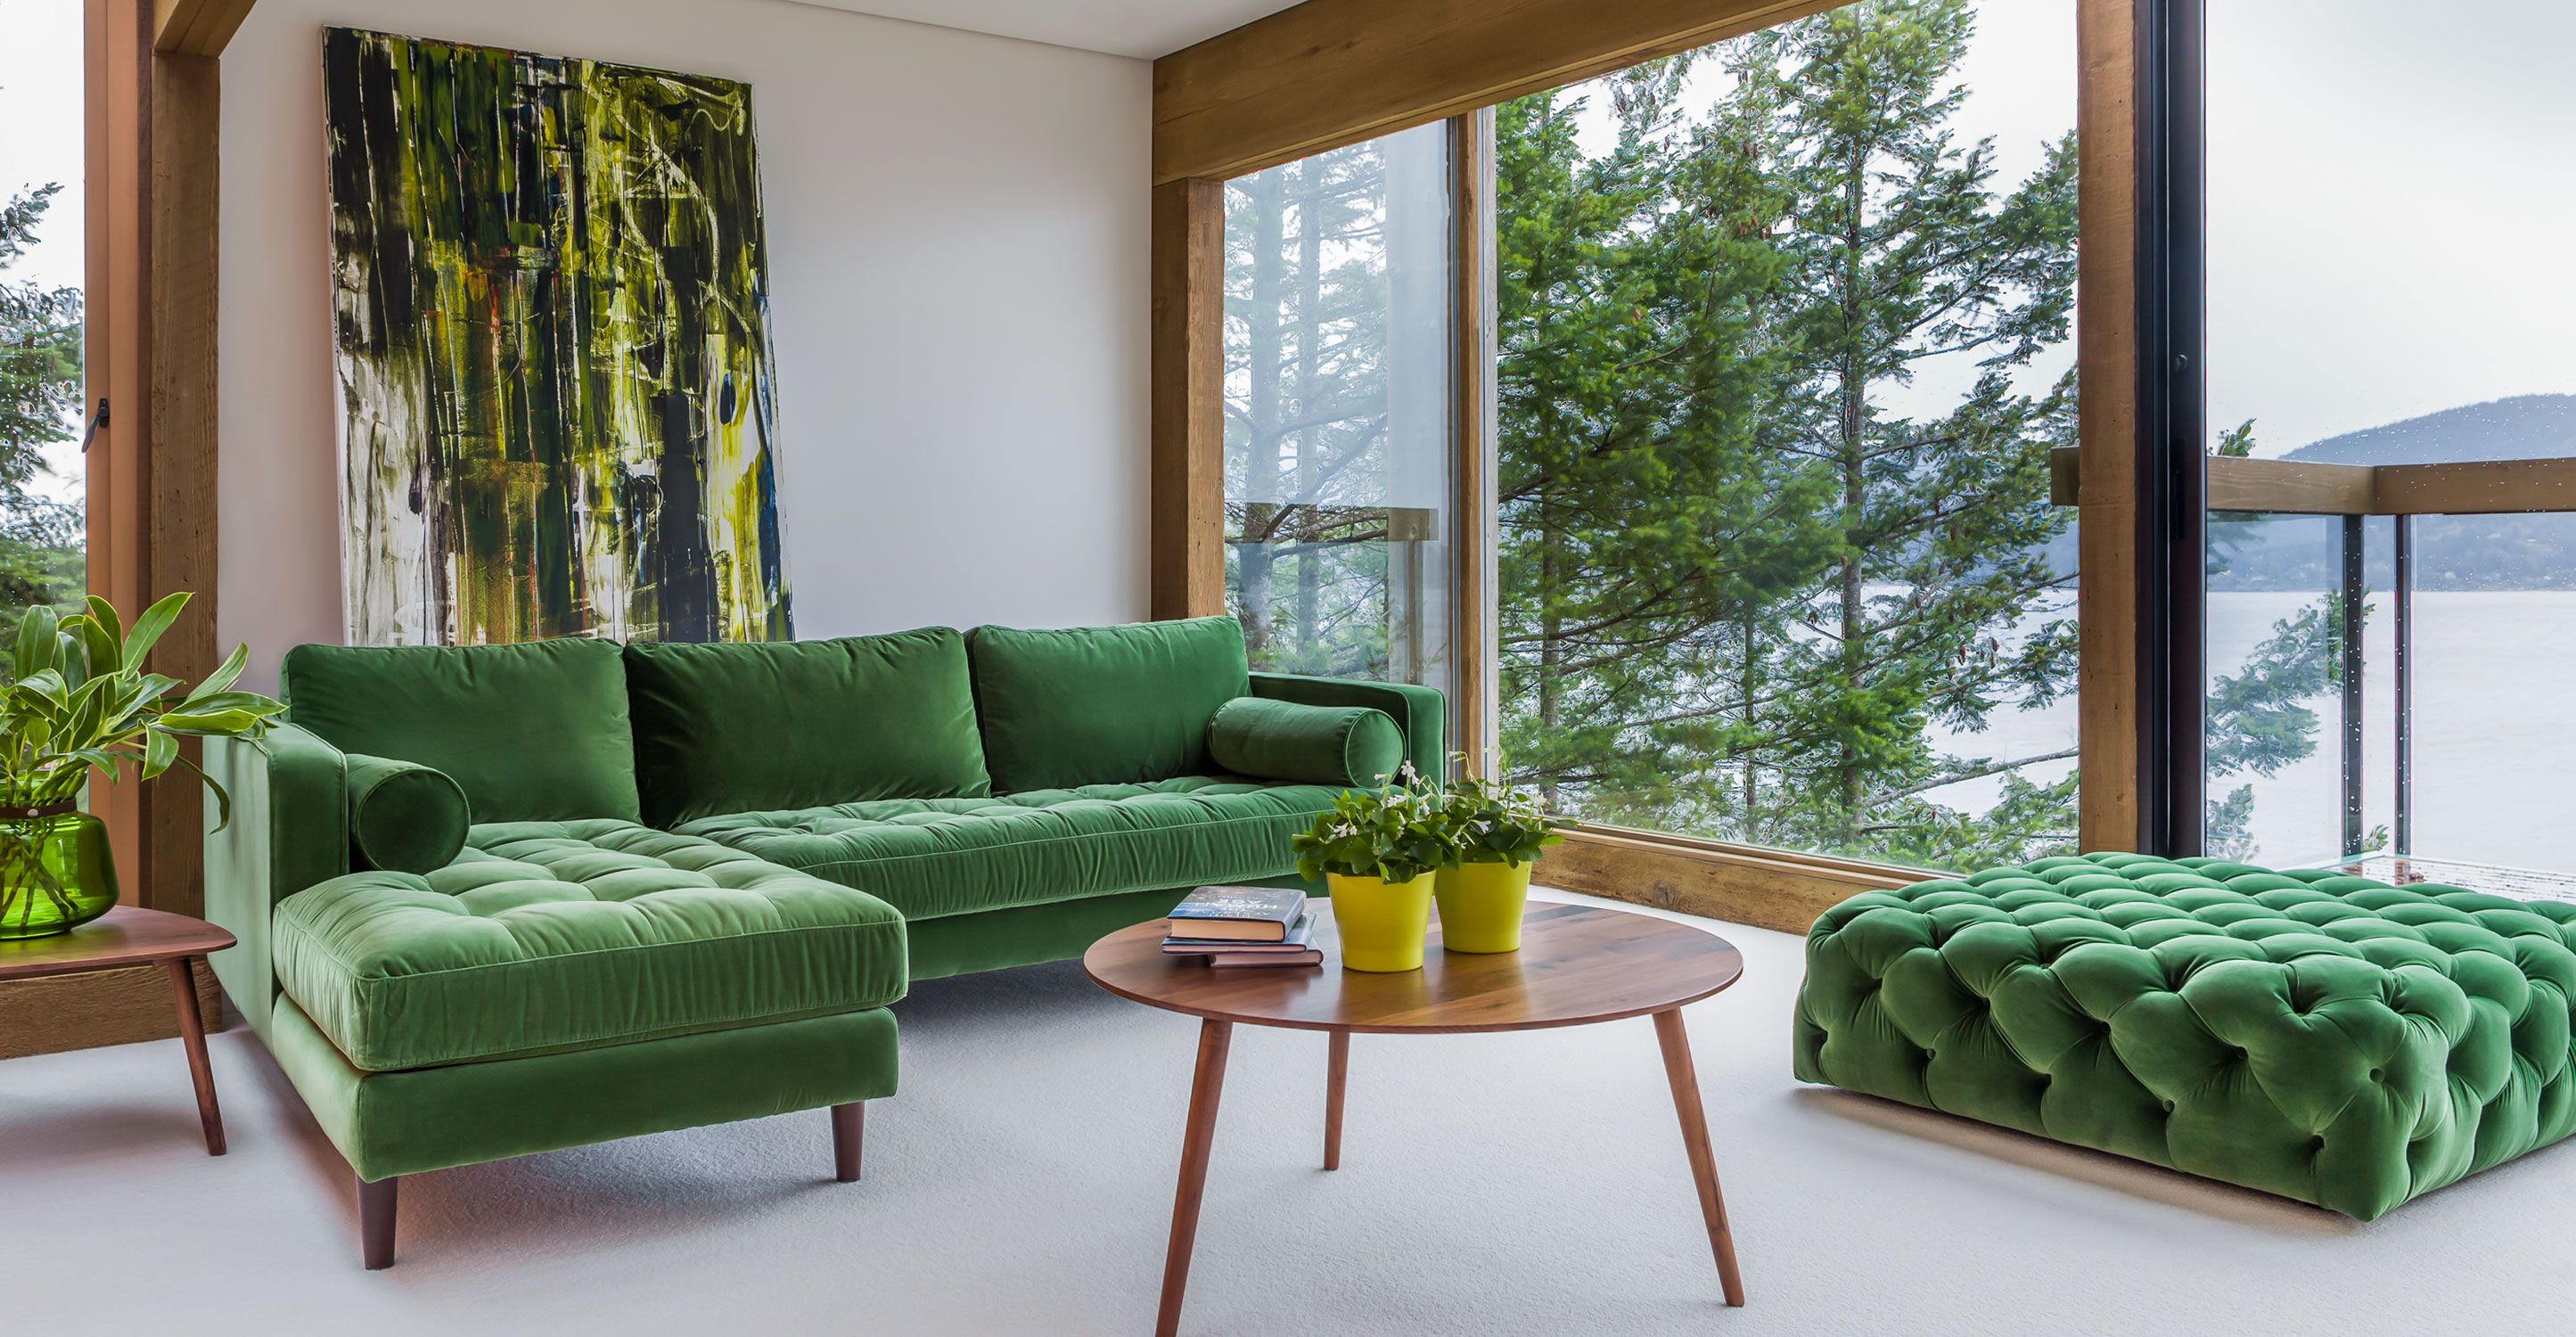 Diamond Gr Green Ottoman Room Furniture